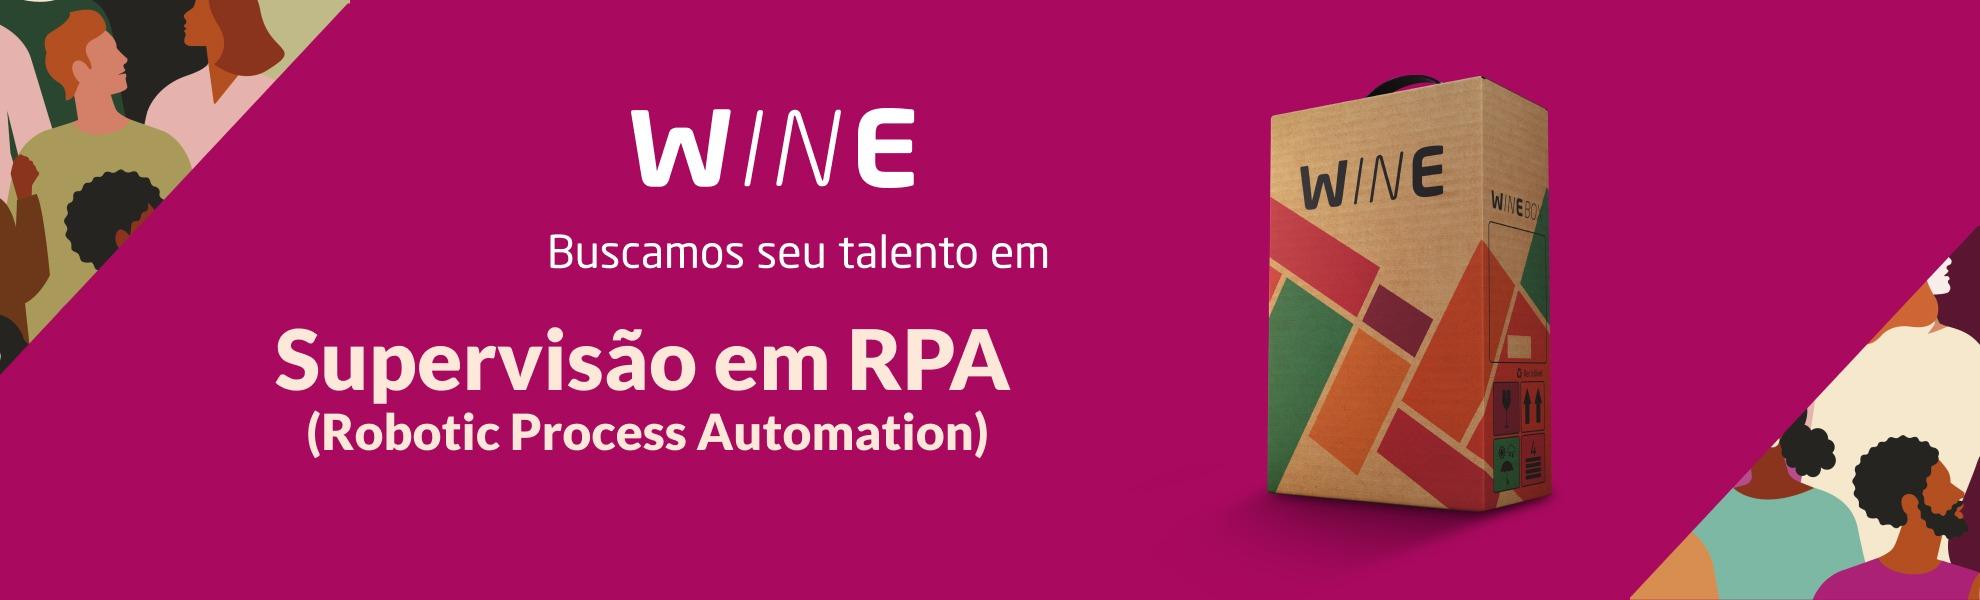 Supervisão na área RPA (Robotic Process Automation)